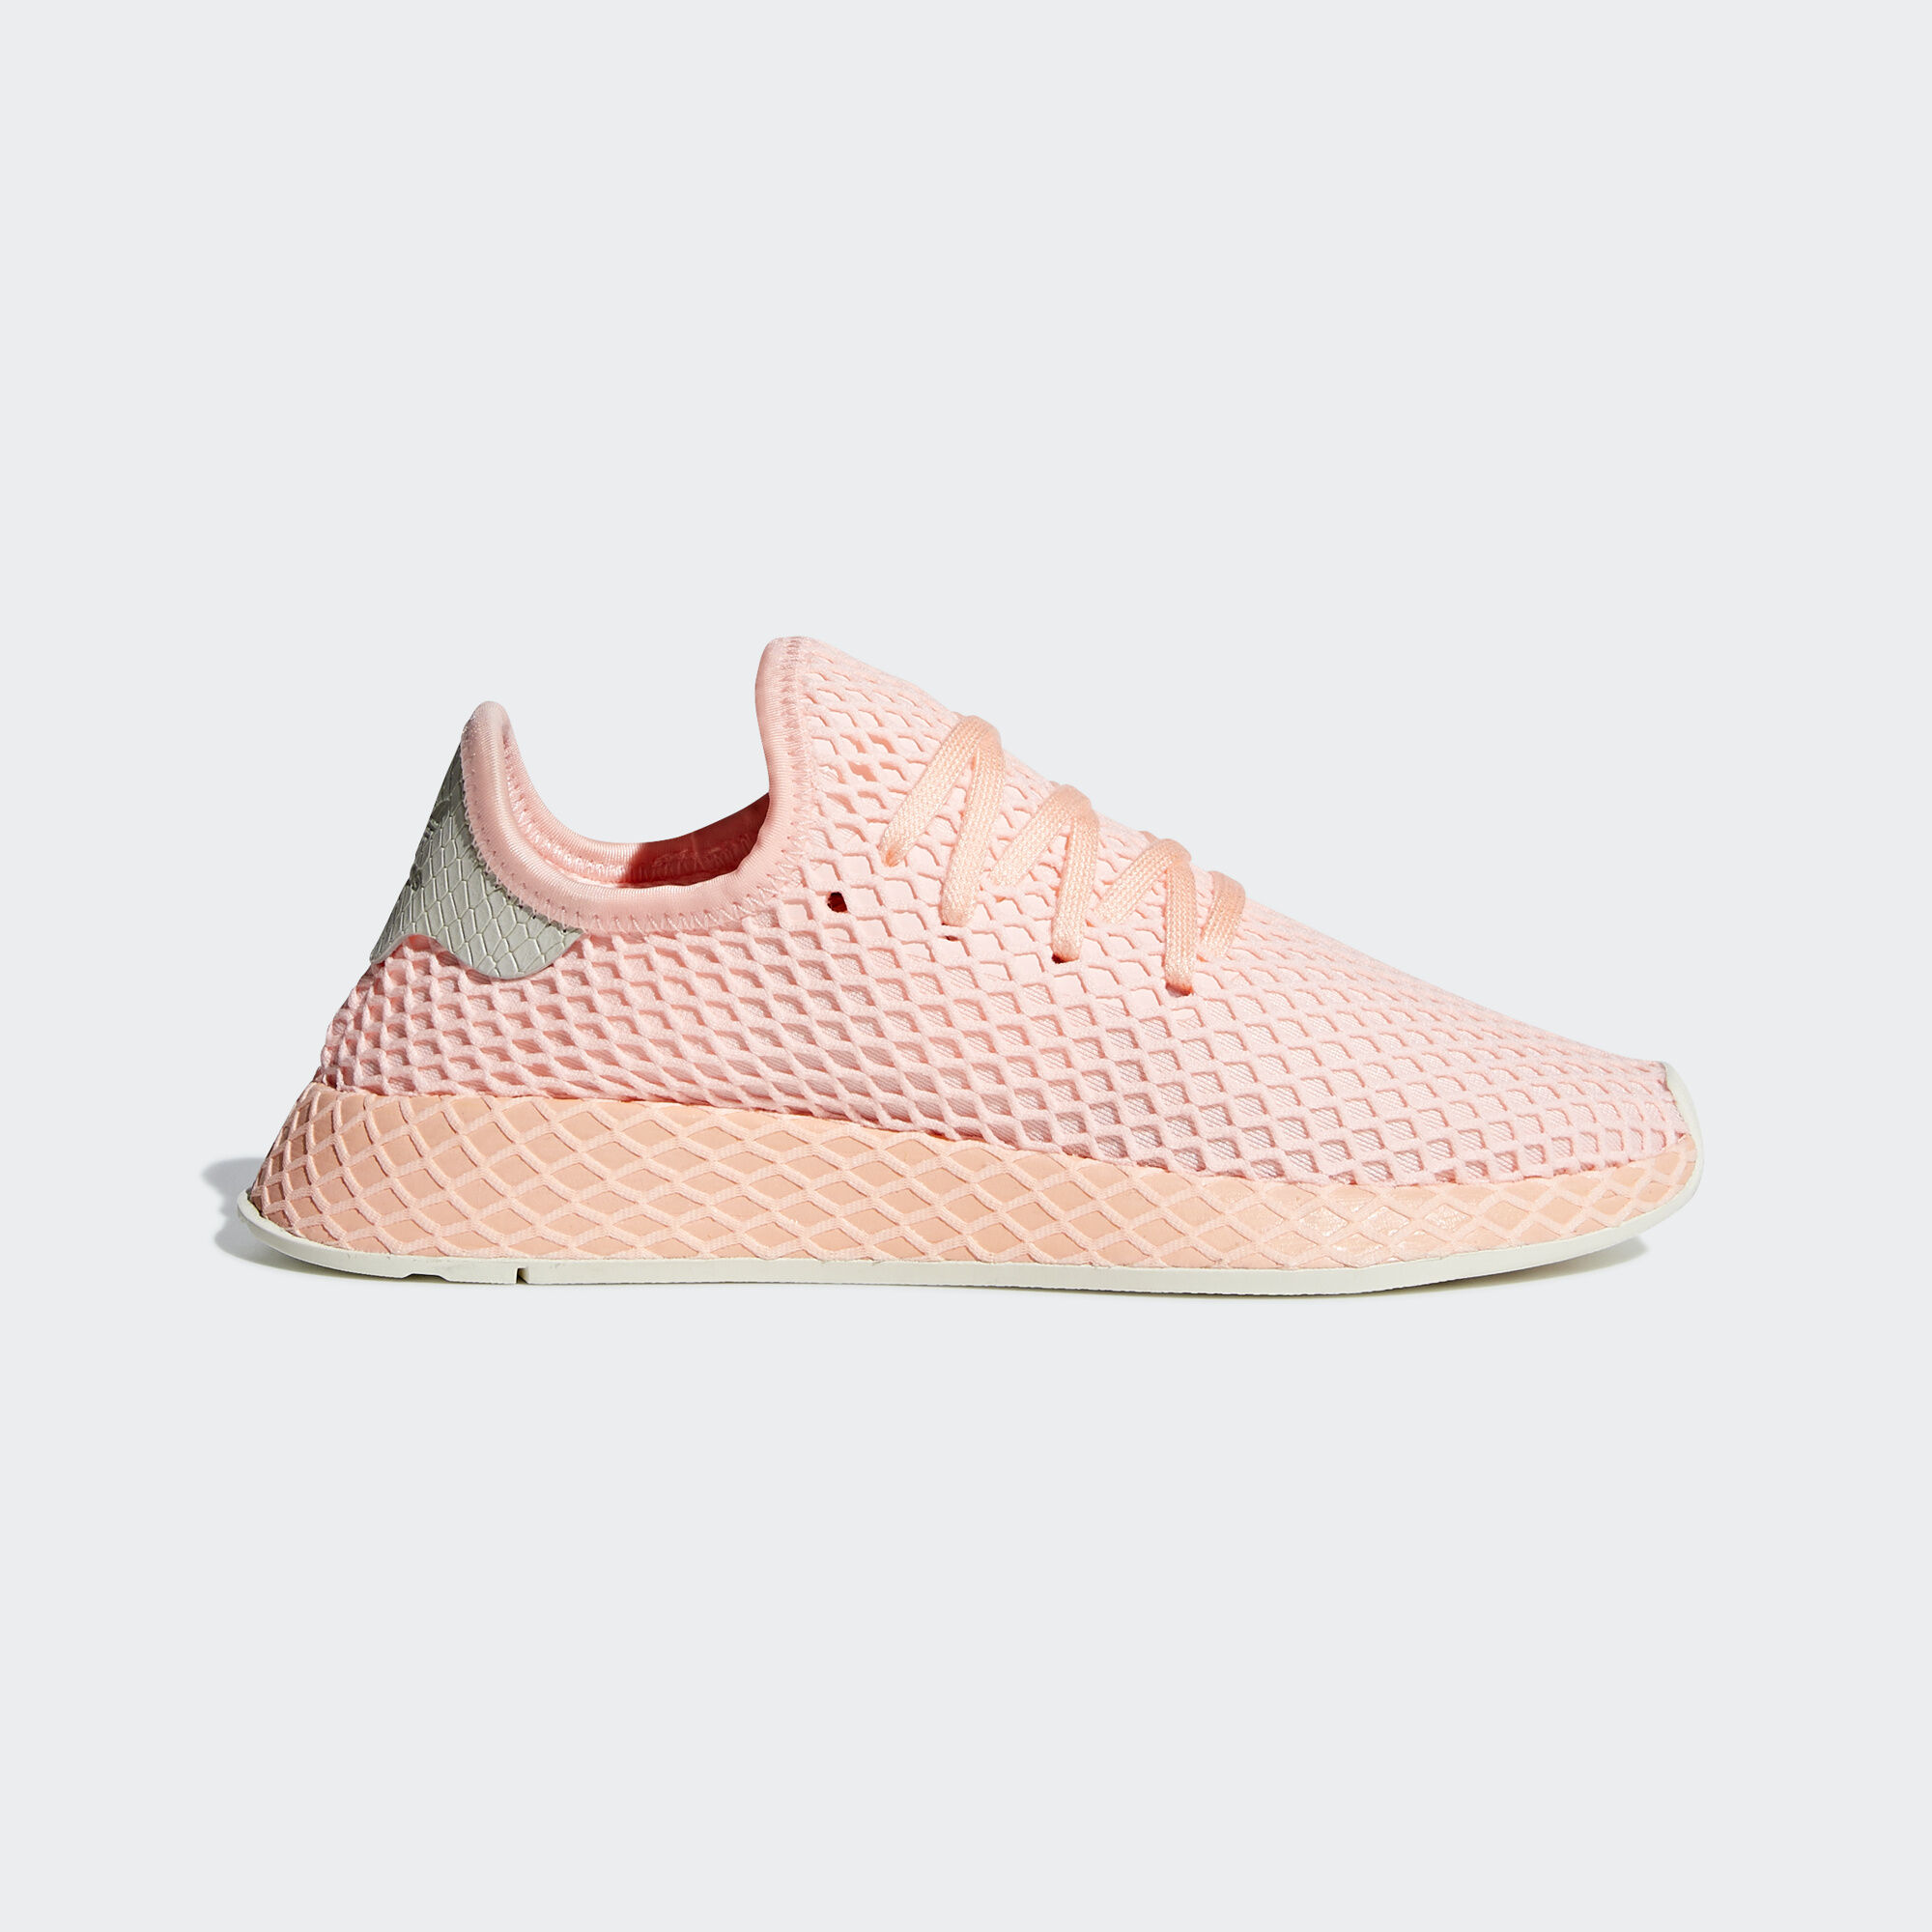 uk availability 66dae 2ea3c adidas - Deerupt Shoes Clear Orange  Clear Orange  Off White B41727